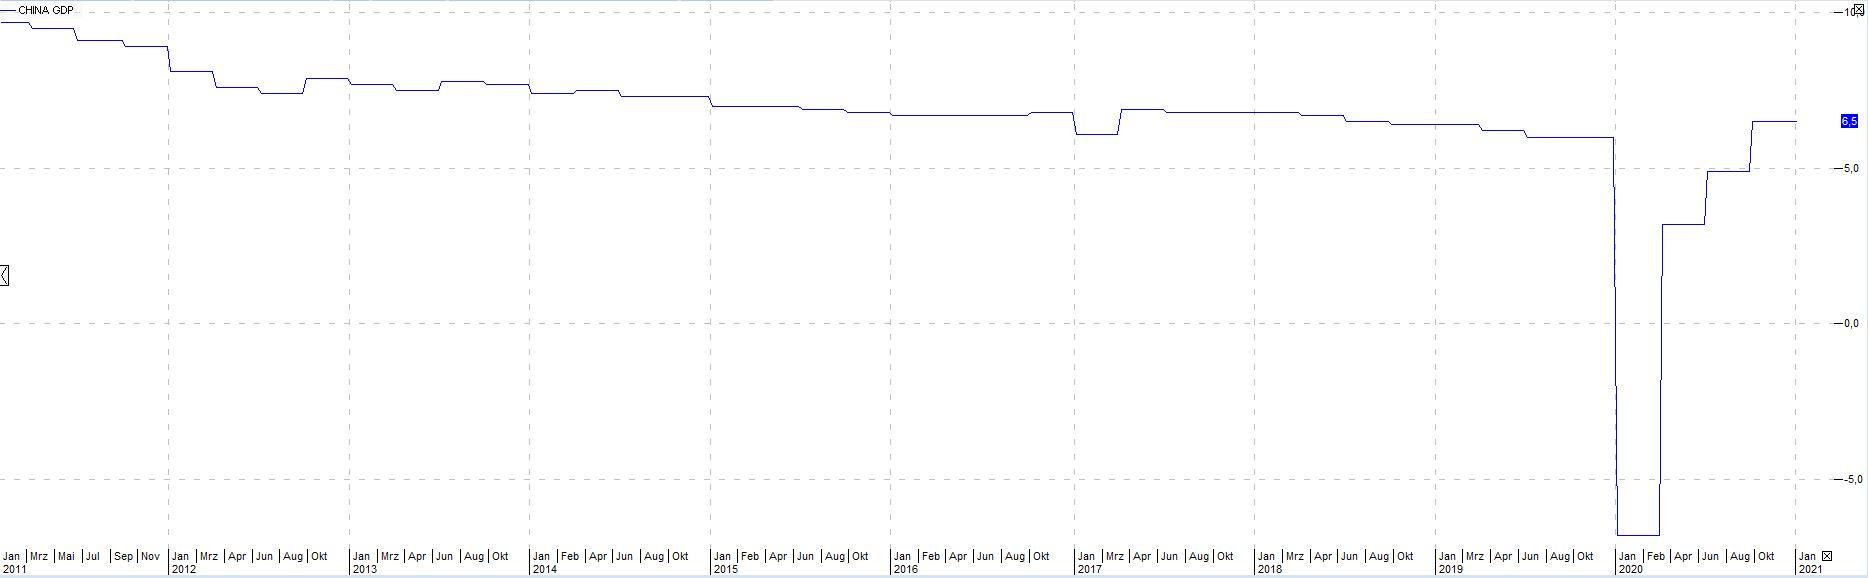 China-BIP-Asien-Konjunktur-Aktien